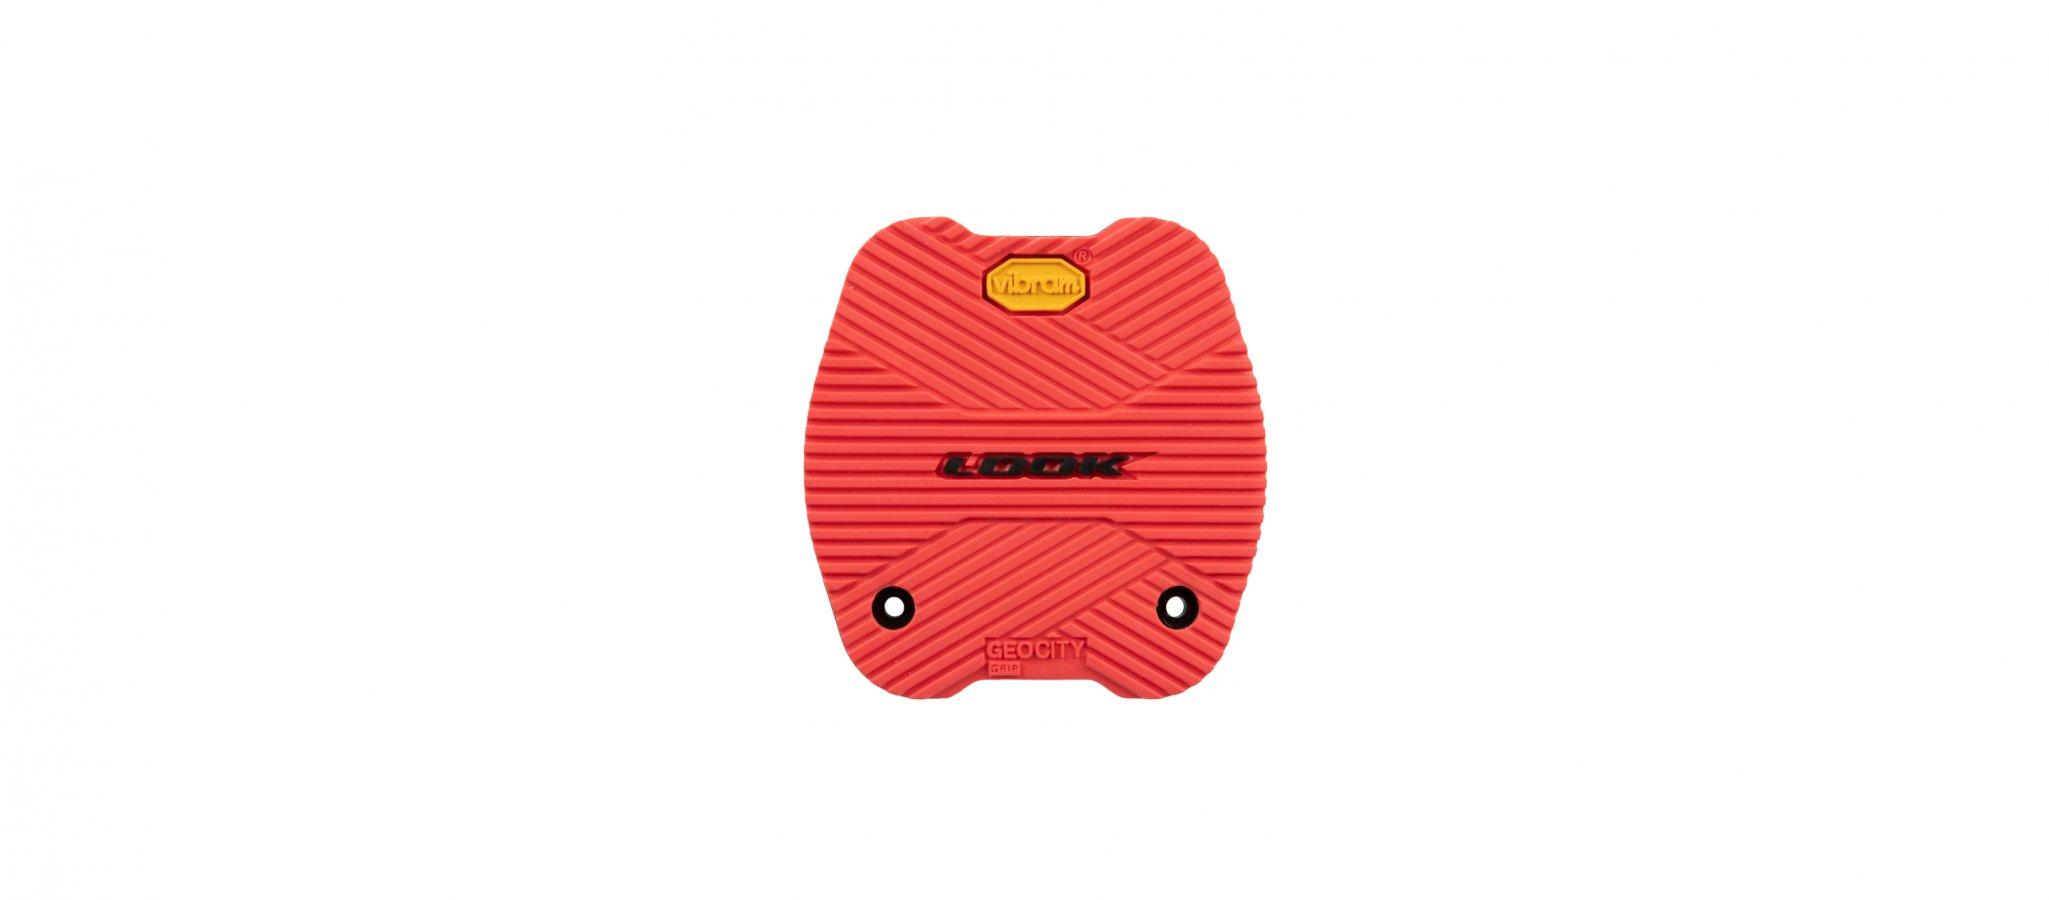 pad-geo-city-grip-red